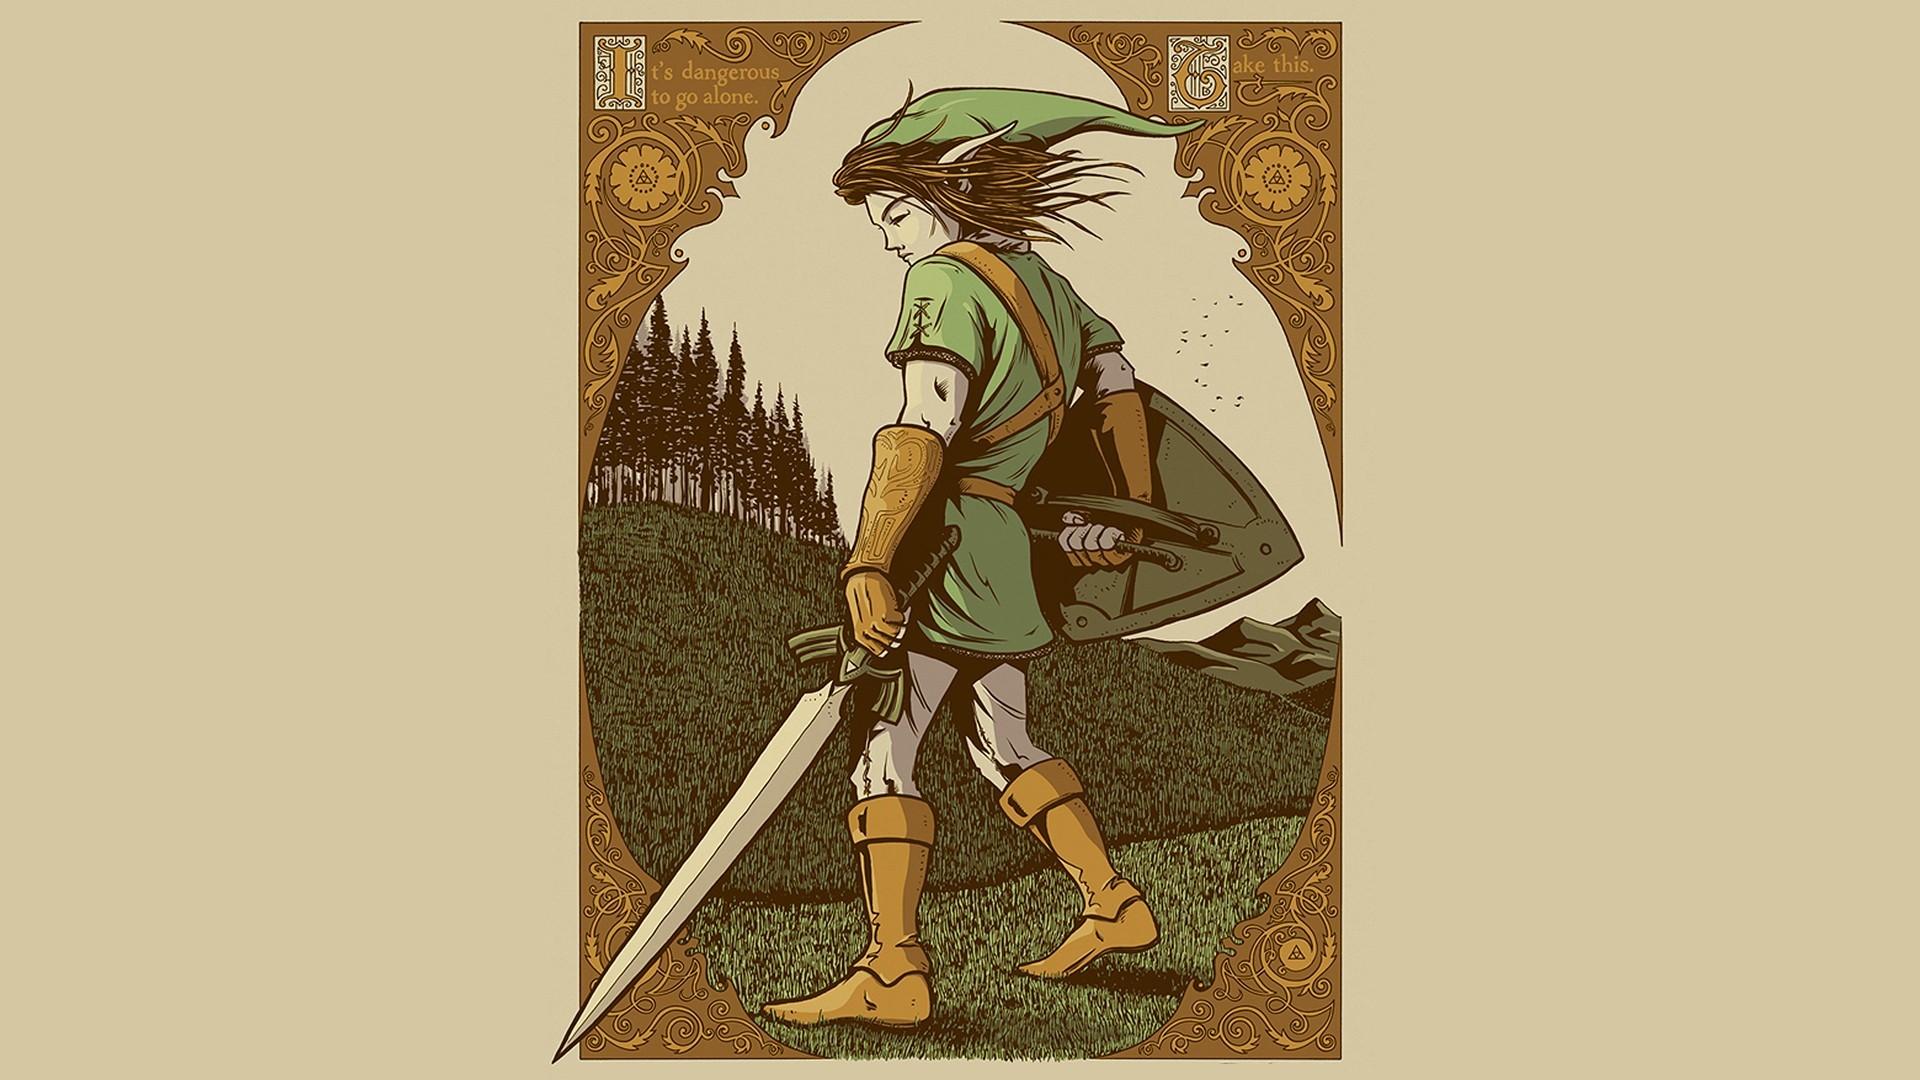 Nintendo video games Link Zelda Ganondorf The Legend of Zelda fan art  Shigeru Miyamoto wallpaper | | 196418 | WallpaperUP